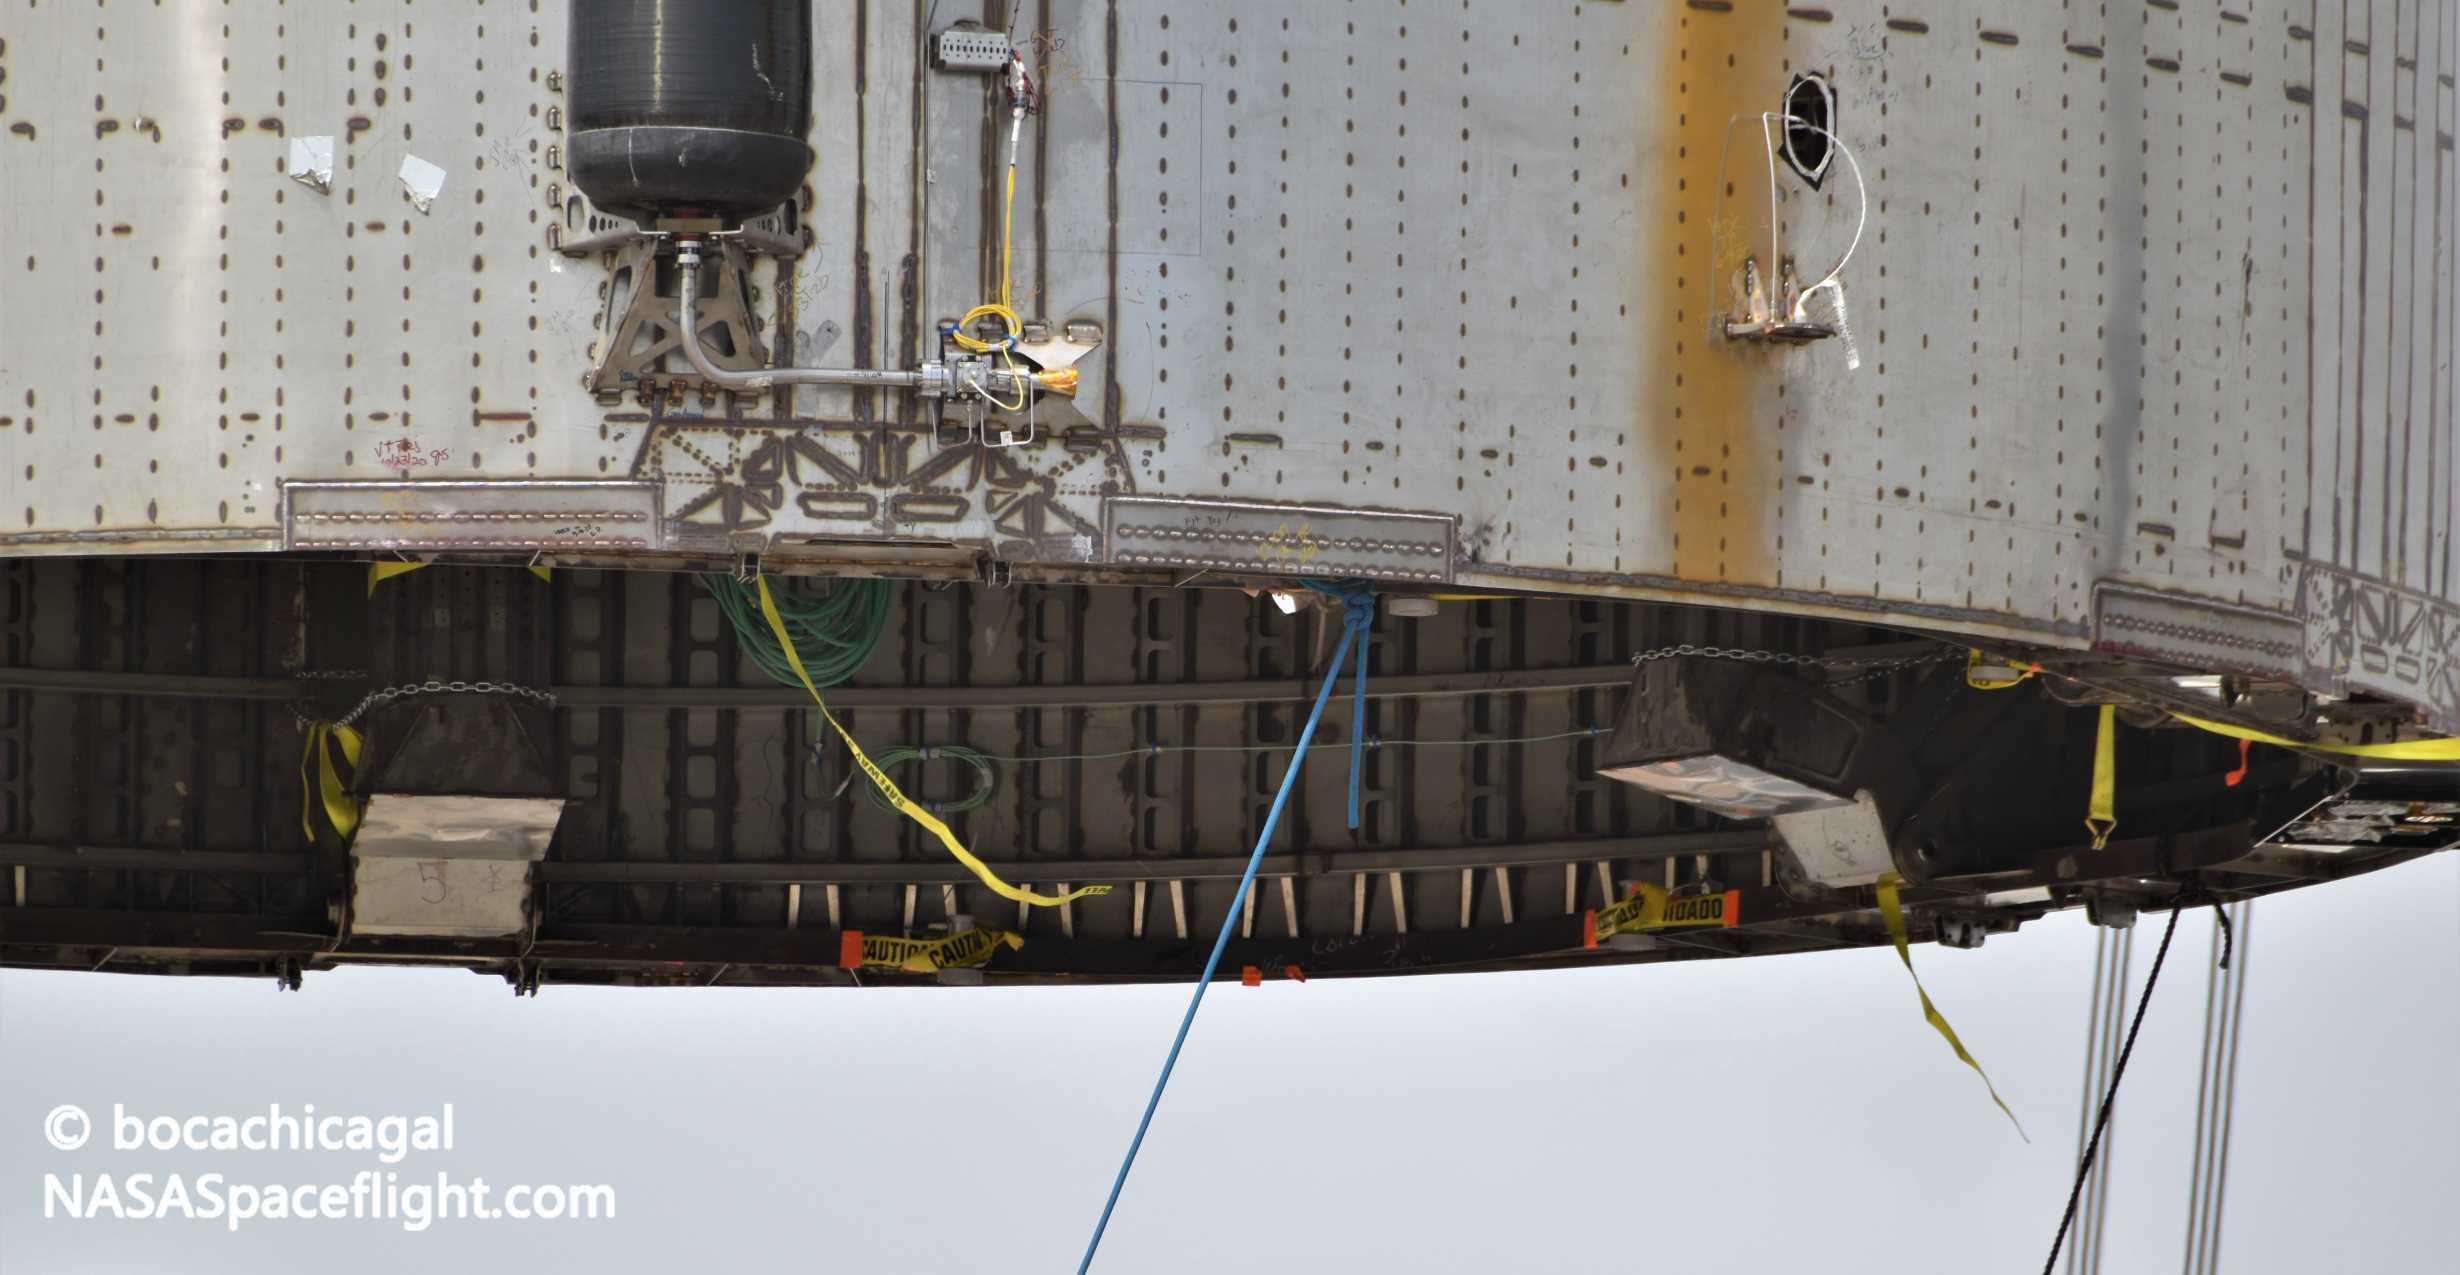 Starship Boca Chica 062420 (NASASpaceflight – bocachicagal) SN5 mount install 6 crop (c)